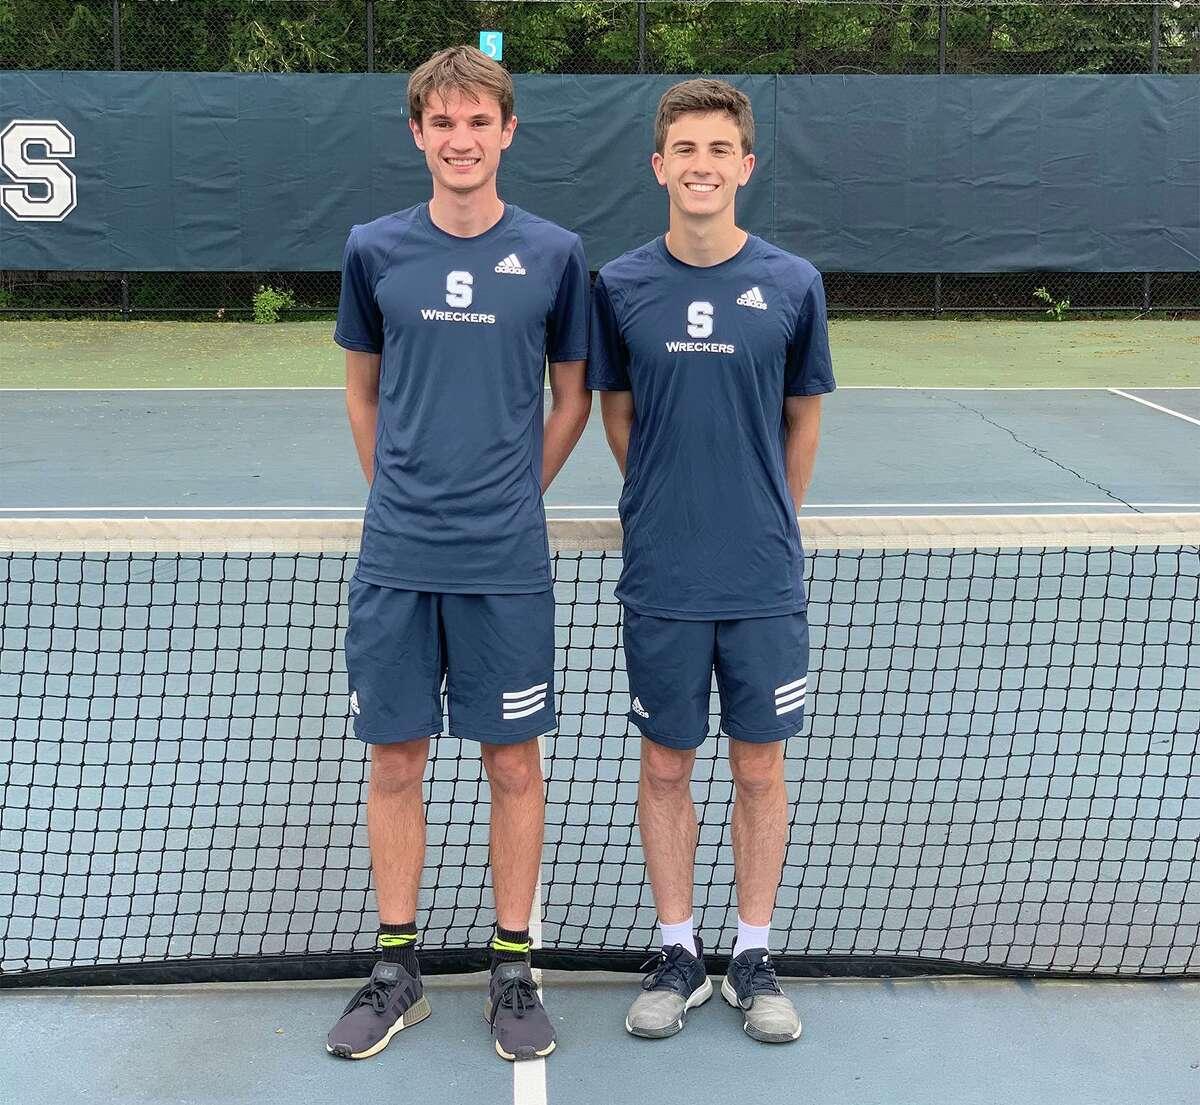 Staples boys tennis senior co-captains Bradley Sheppard and Lucas Haymes.